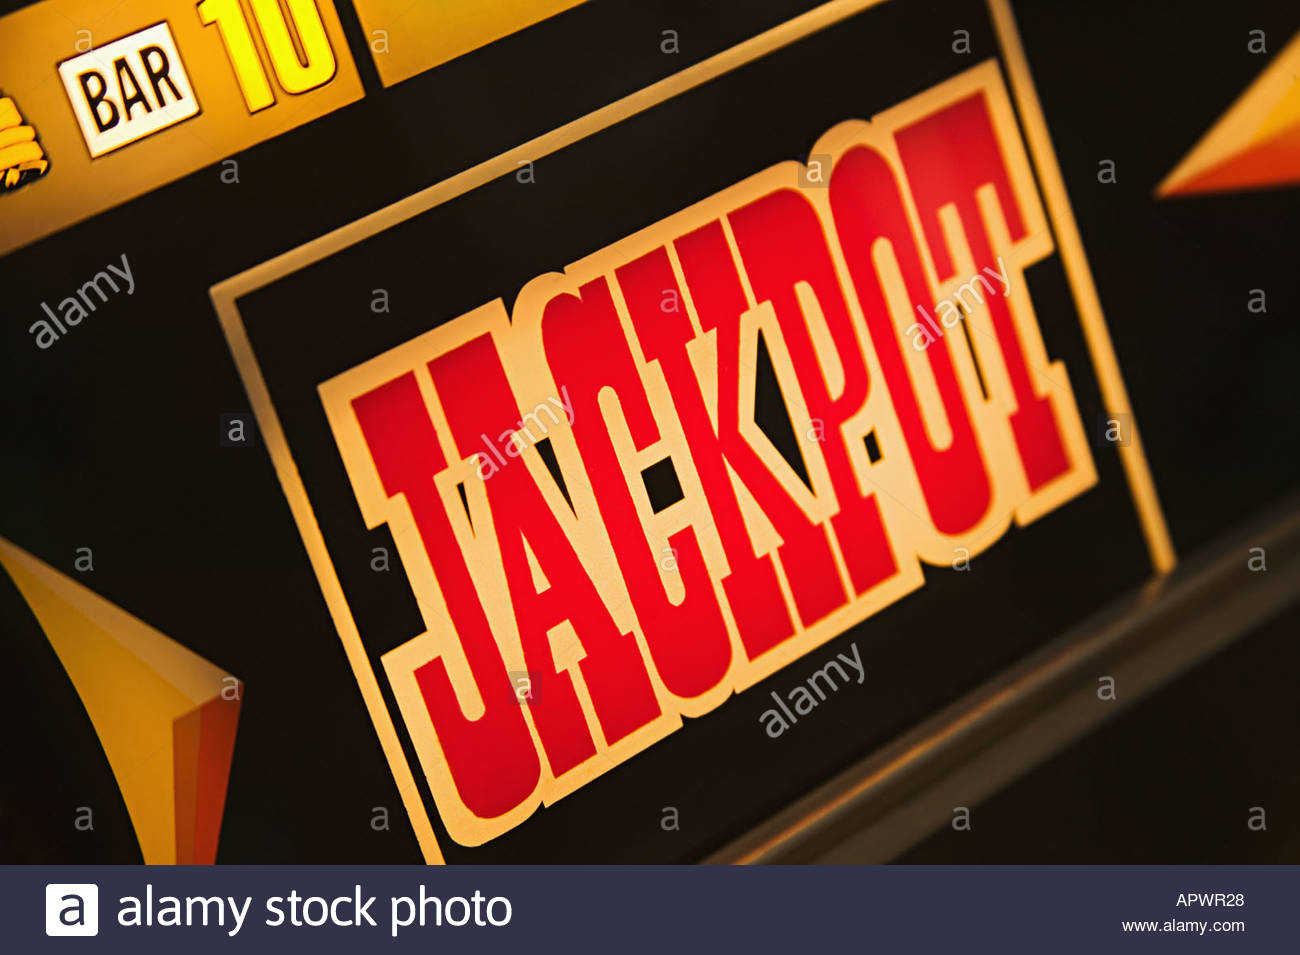 Jackpot - Stock Image